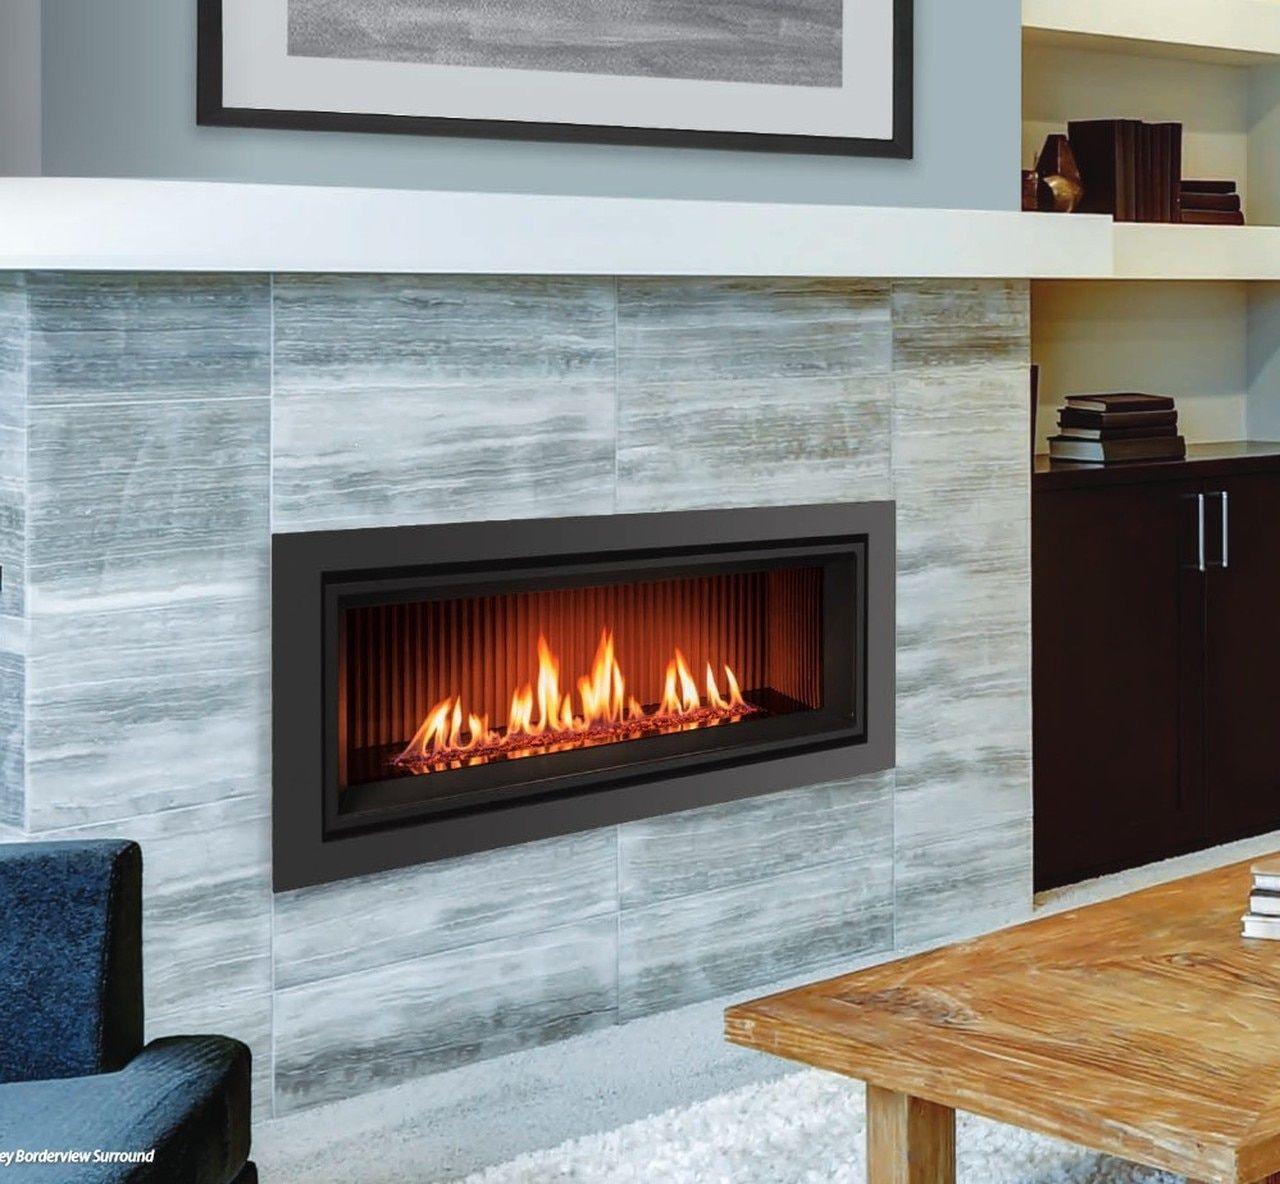 Enviro C34 Linear Gas Fireplace C34 Enviro Fireplace Gas